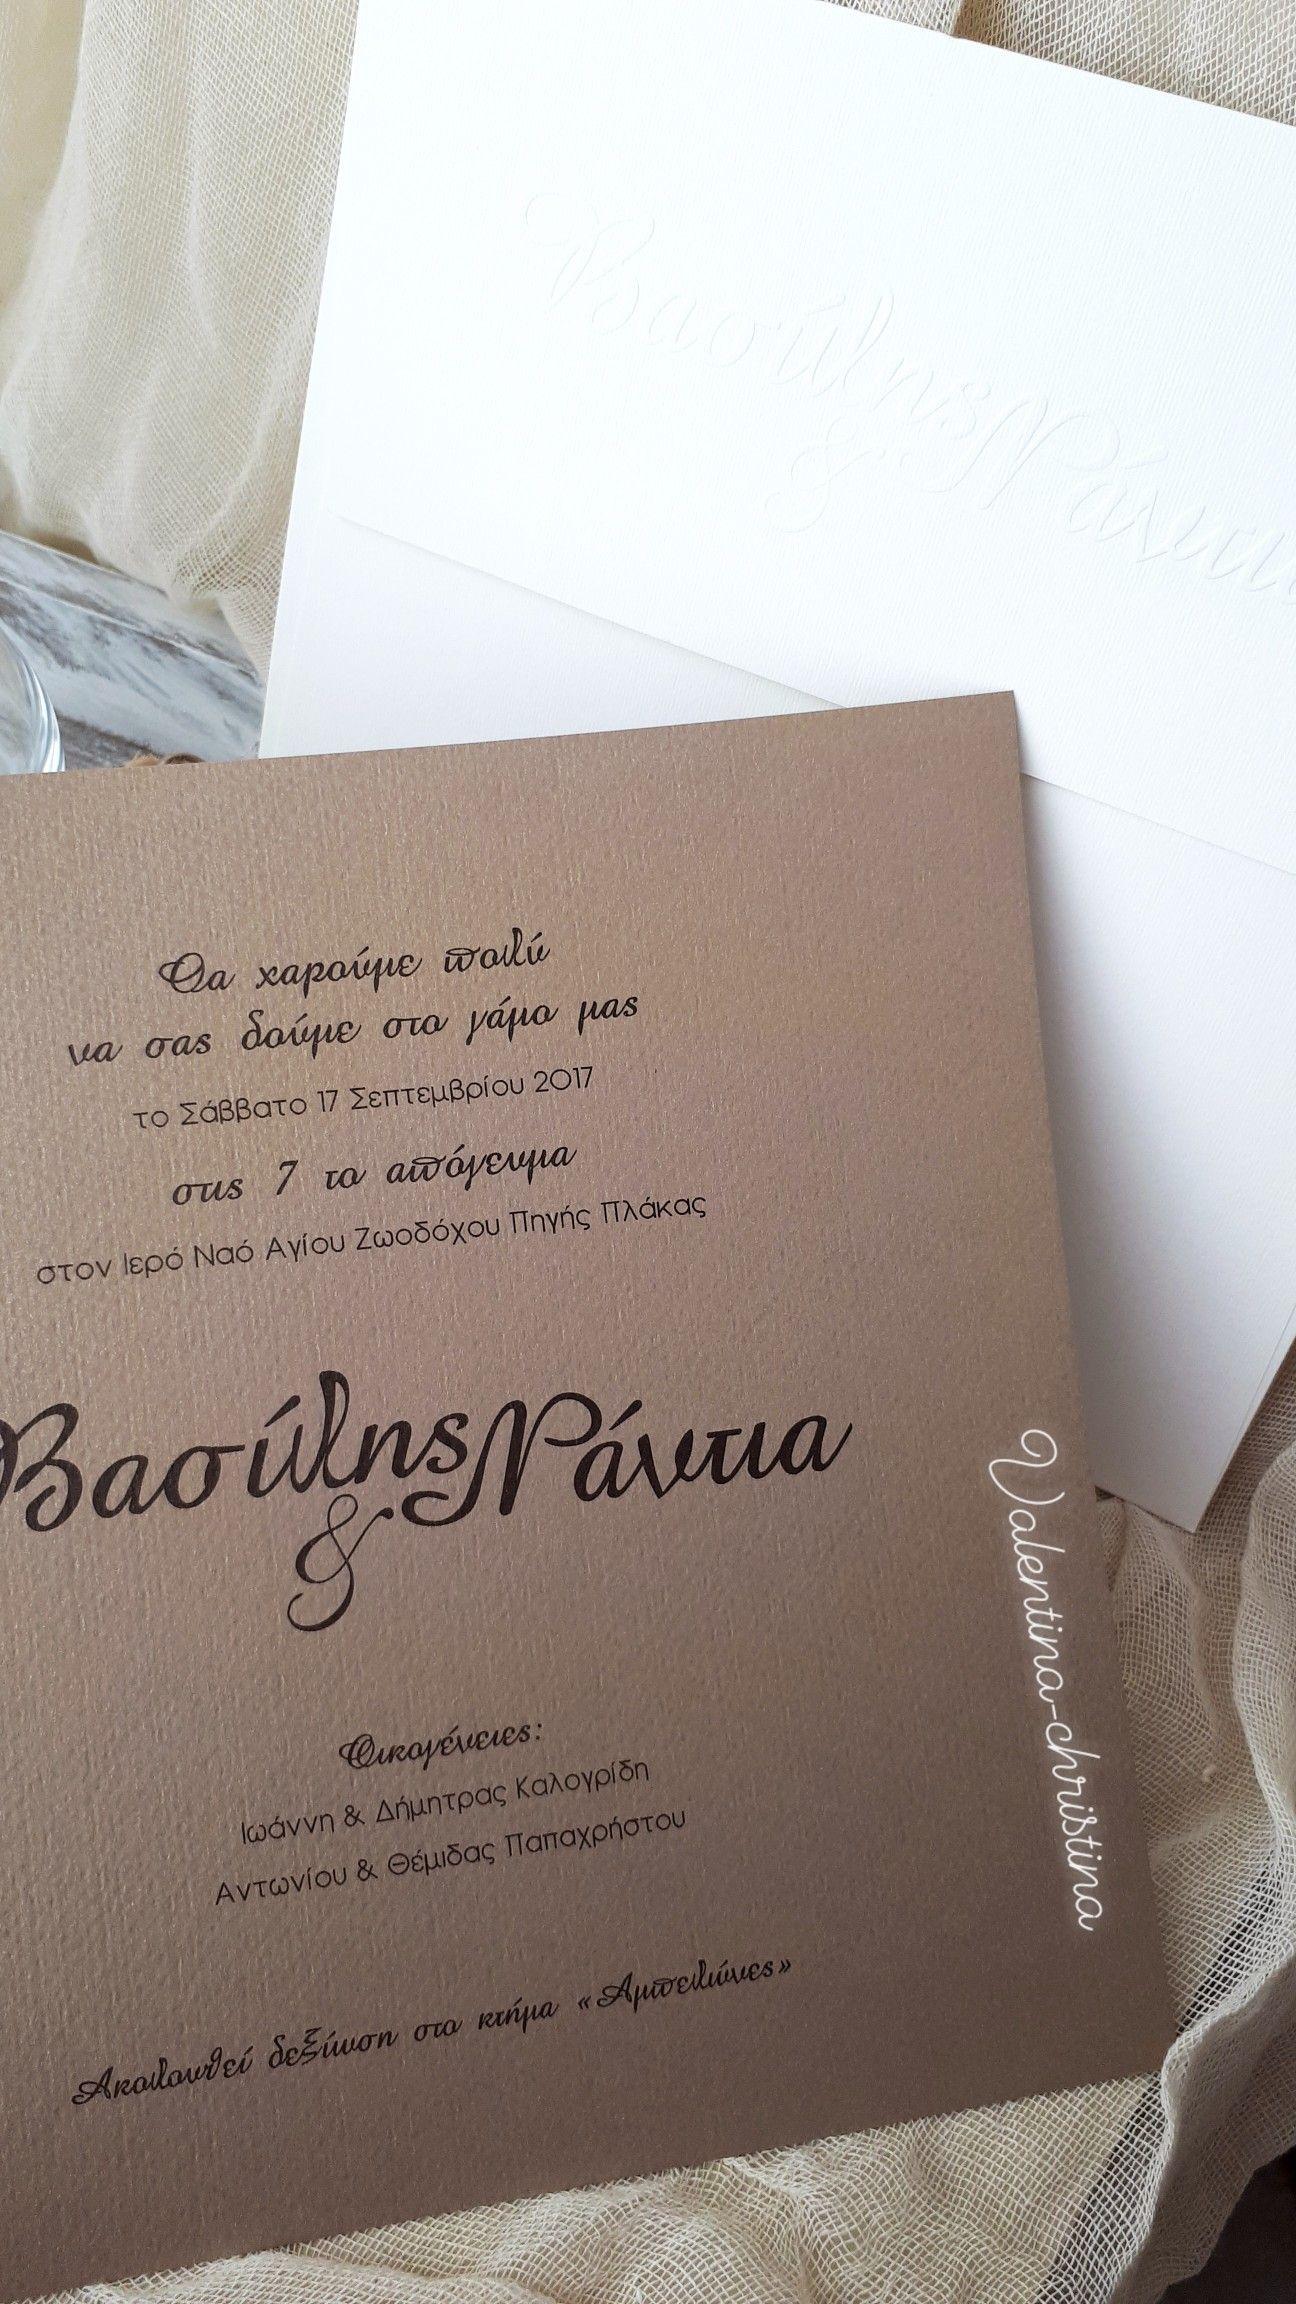 449adba07fe1 Απλά προσκλητήρια γάμου με λευκό γκοφρέ φάκελο και σε καφέ VINTAGE το  κυρίως κείμενο by valentina